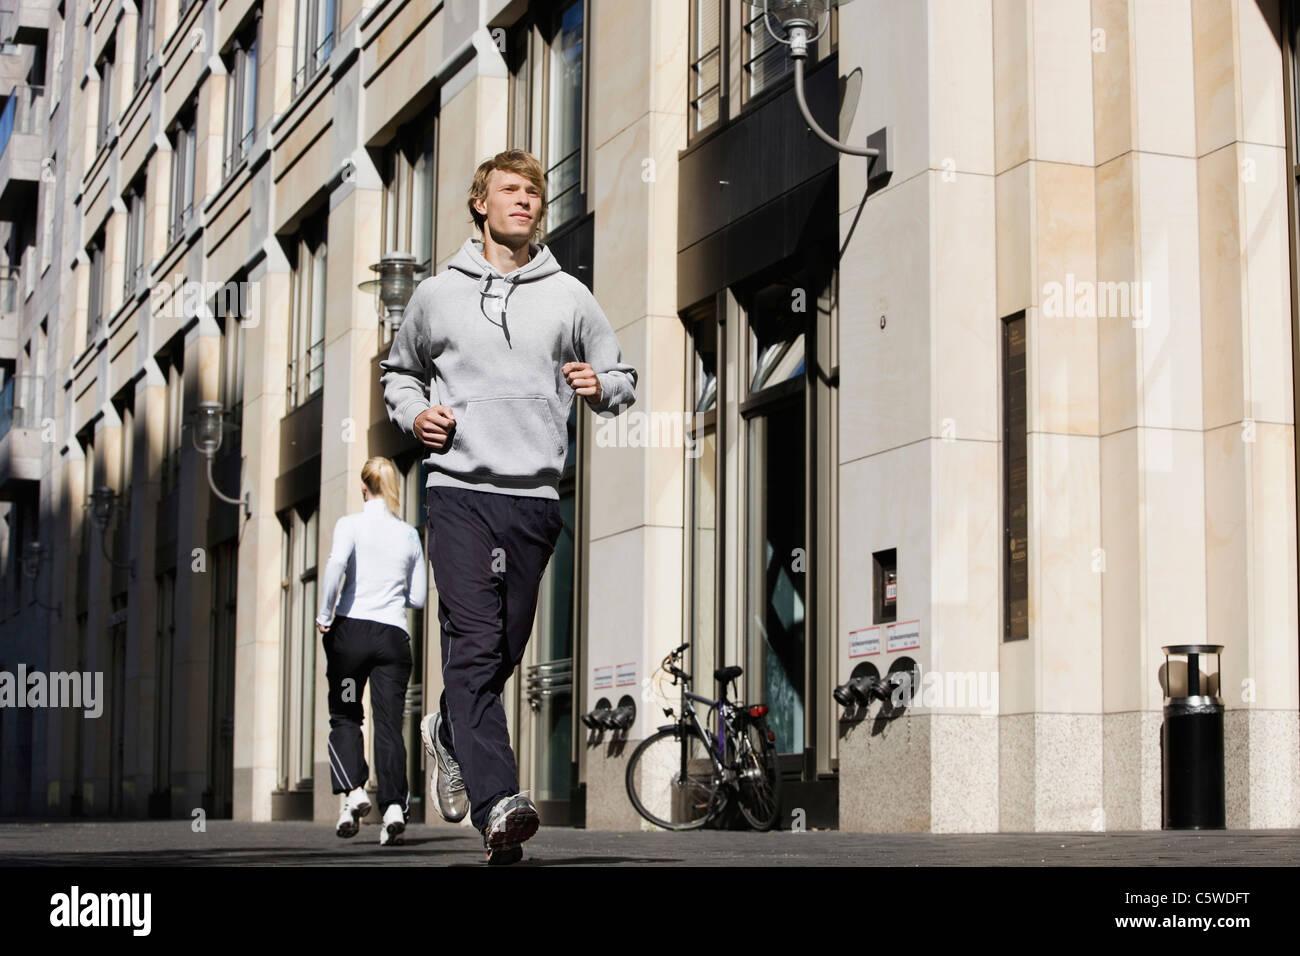 Deutschland, Berlin, Jogger in der Stadt Stockbild